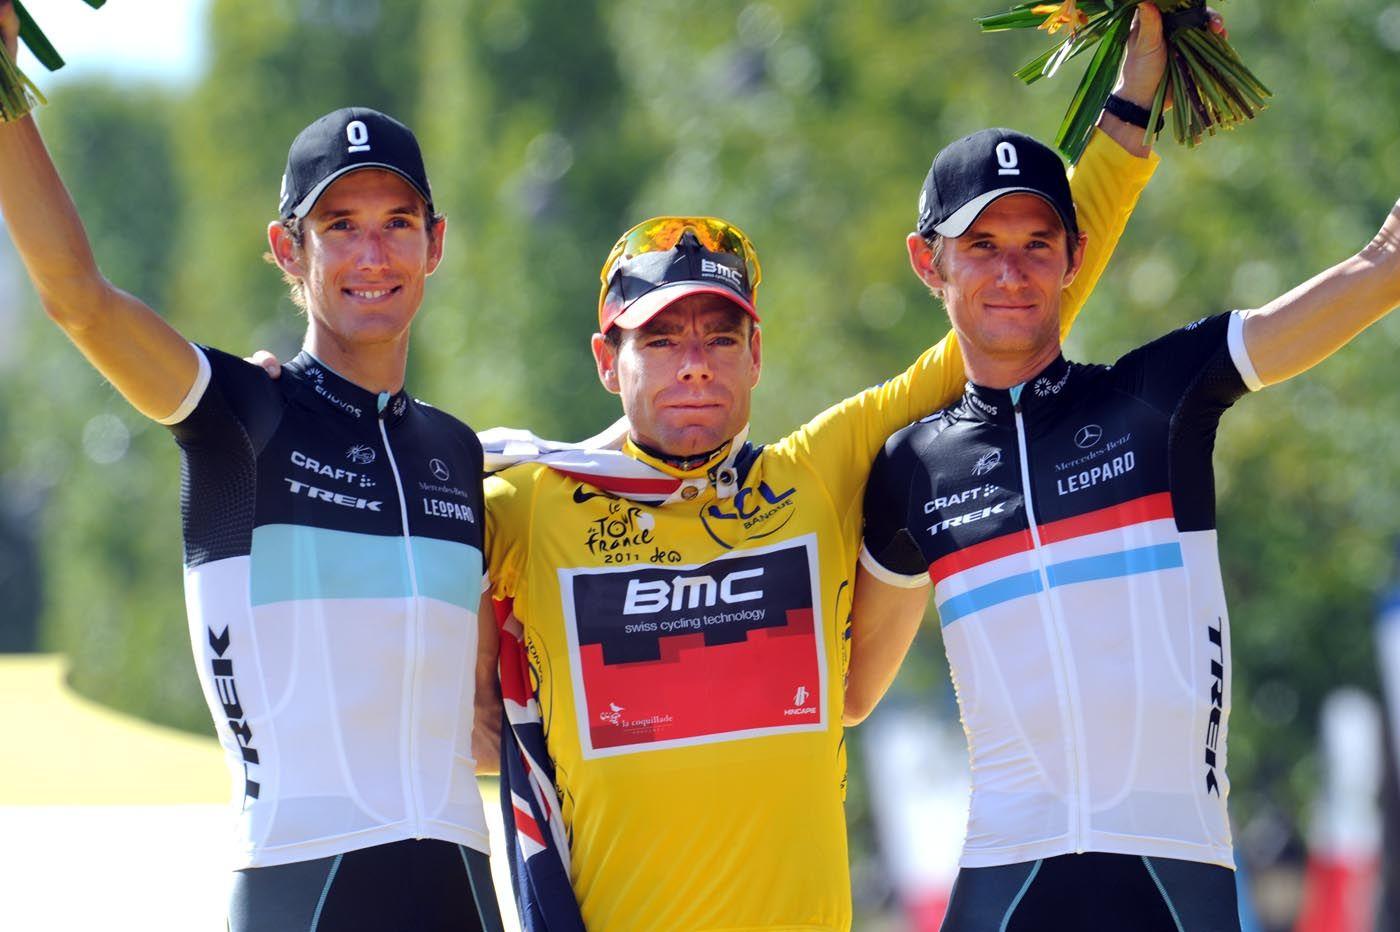 Tdf11st21 Podium 1 Jpg 1400 932 Pixels Tour De France Competitive Cycling Sports Hero